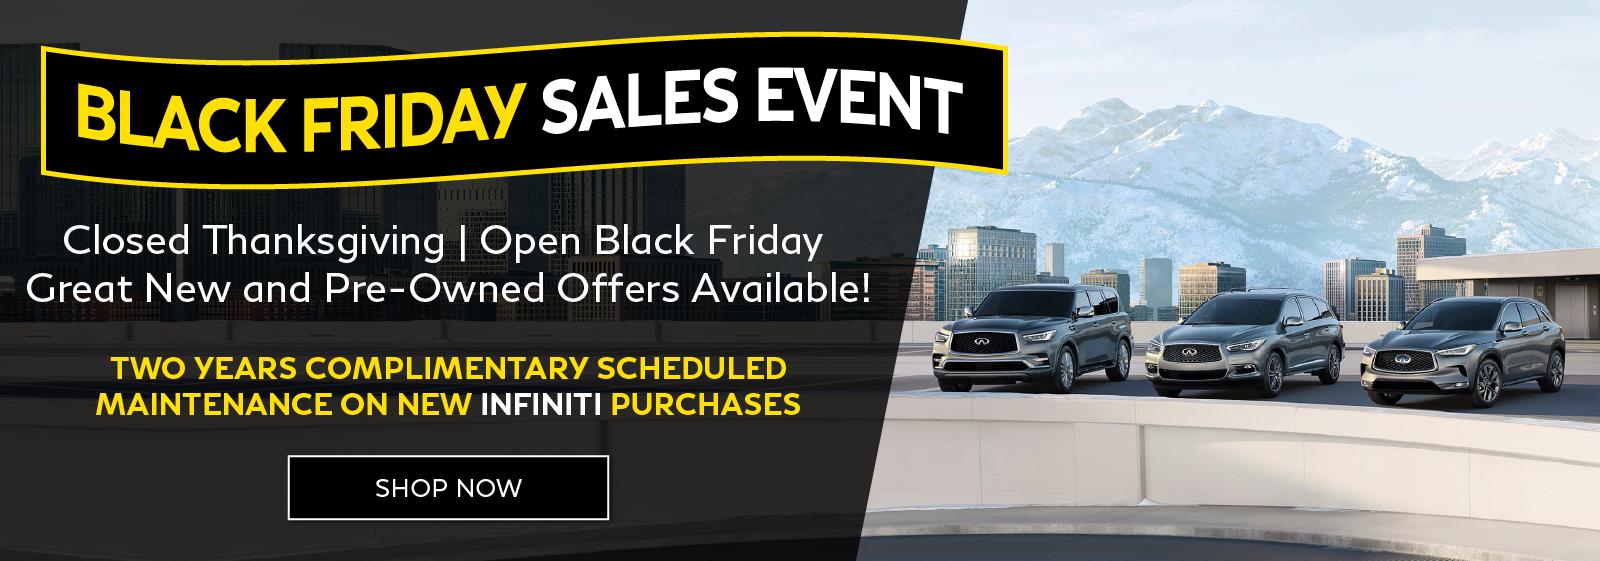 Black Friday Sales Event at INFINITI of San Jose. Shop Now.